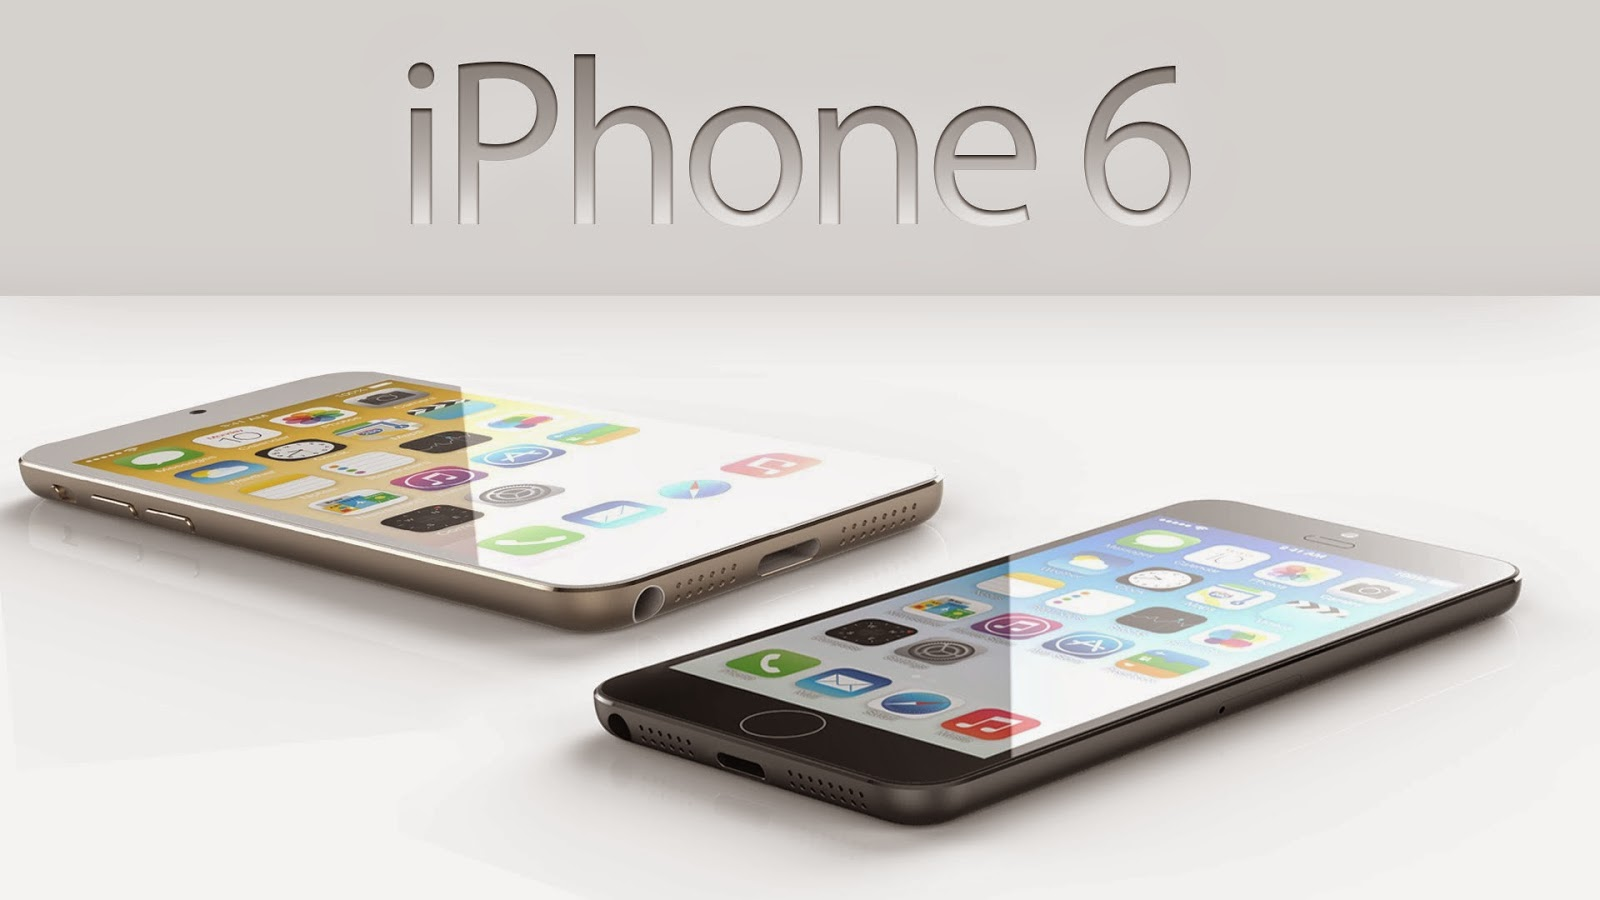 iPhone 6 Beautiful Wallpaper